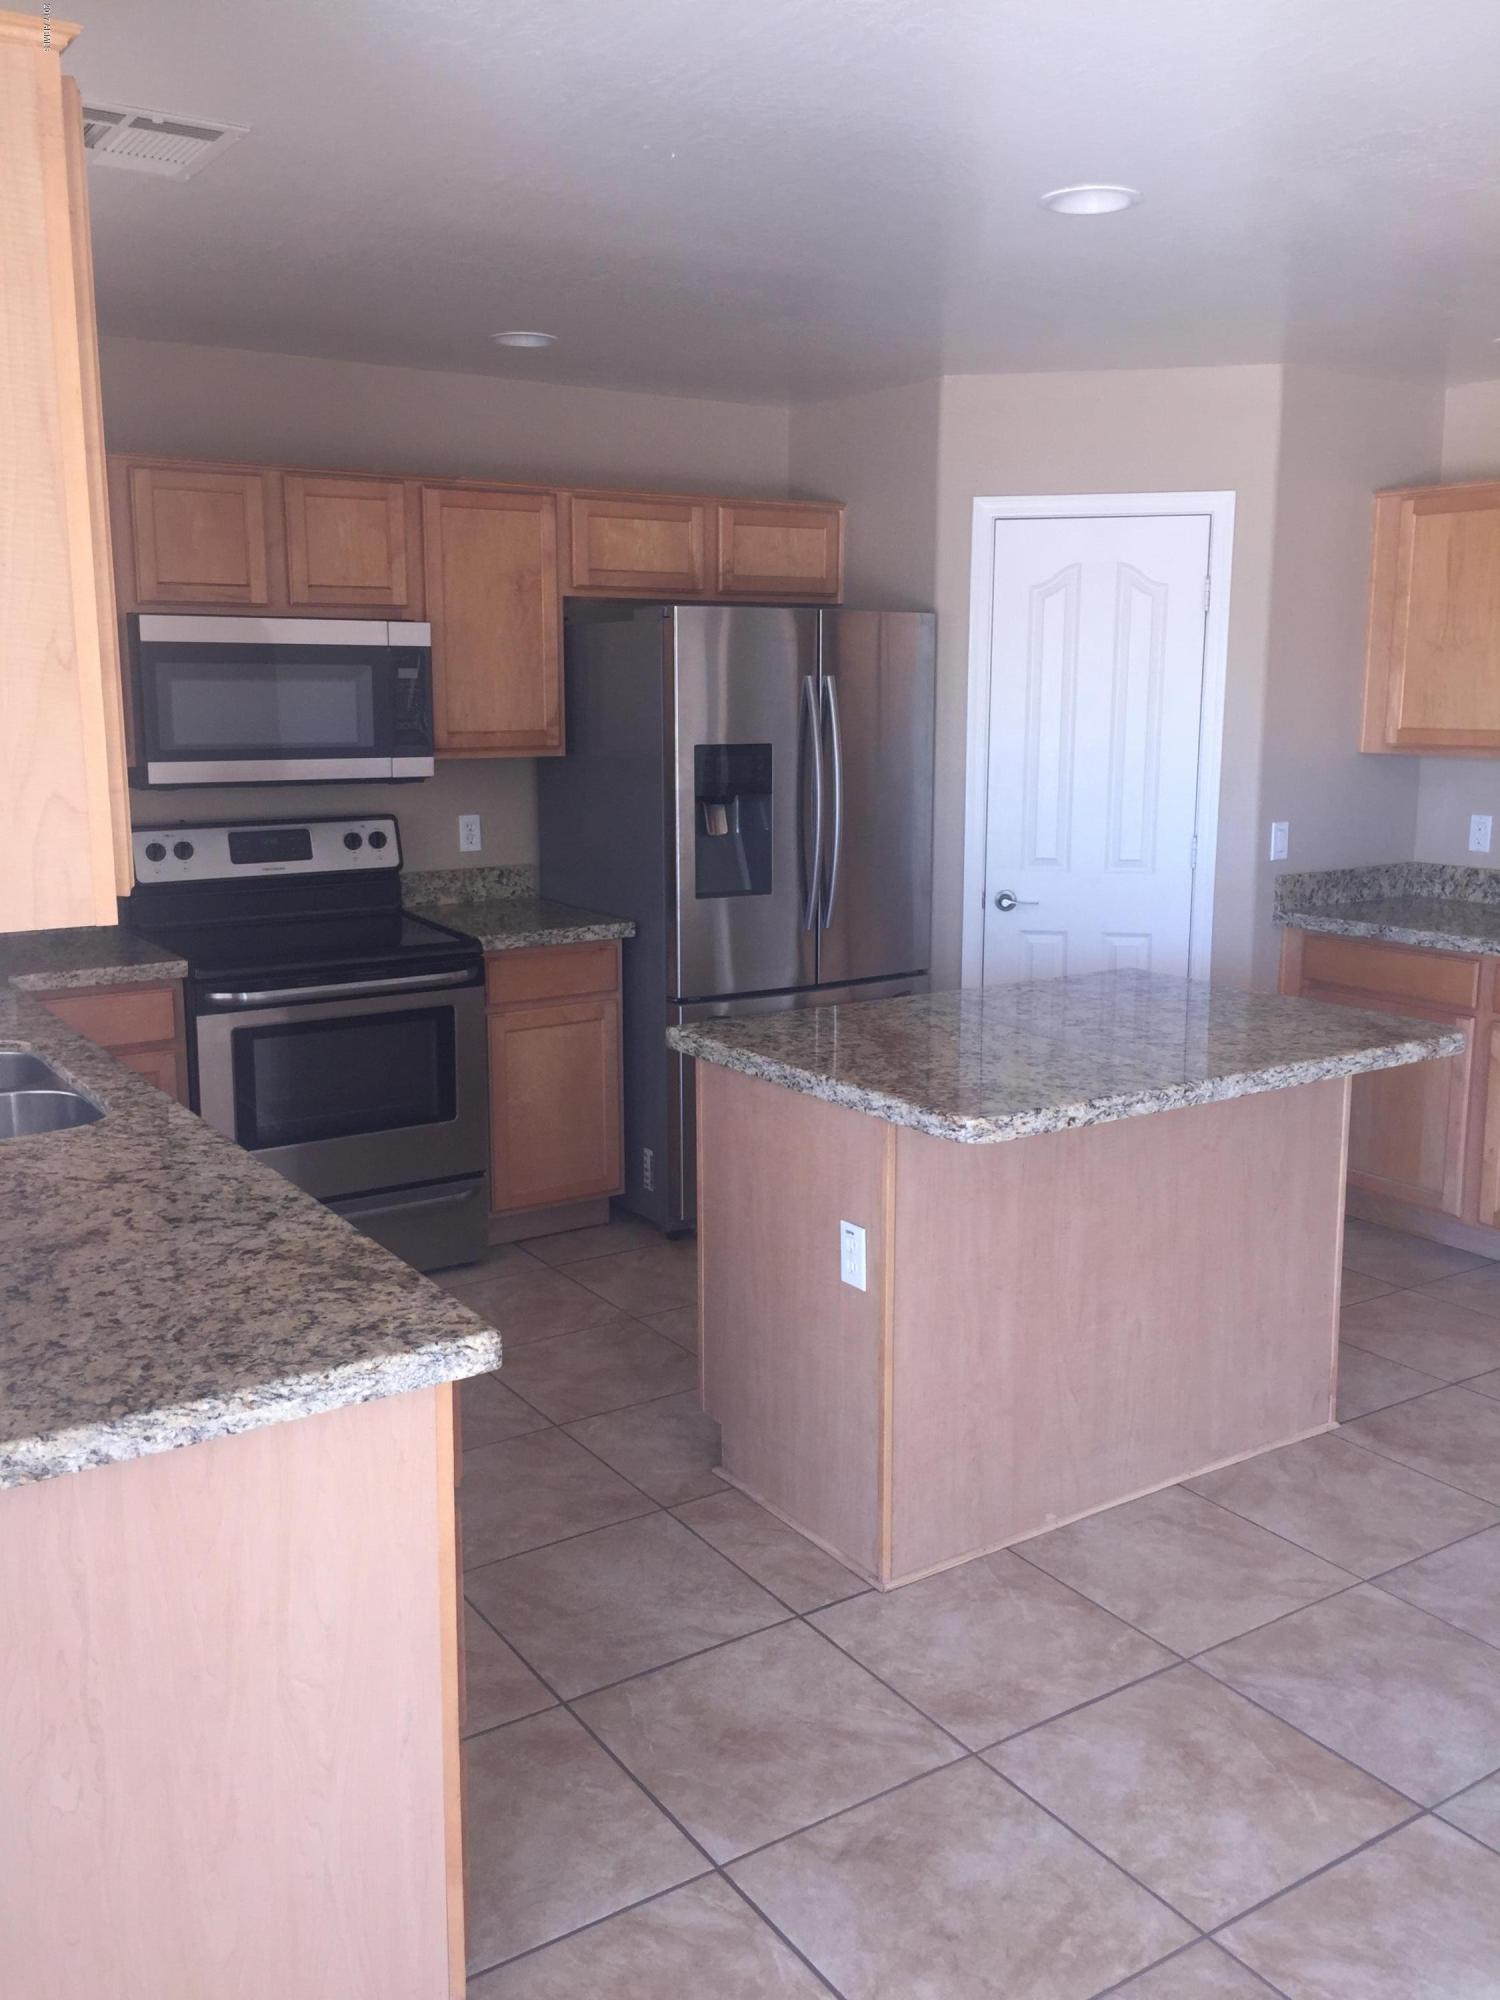 MLS 5647516 2826 W GRENADINE Road, Phoenix, AZ 85041 Phoenix AZ Barcelona